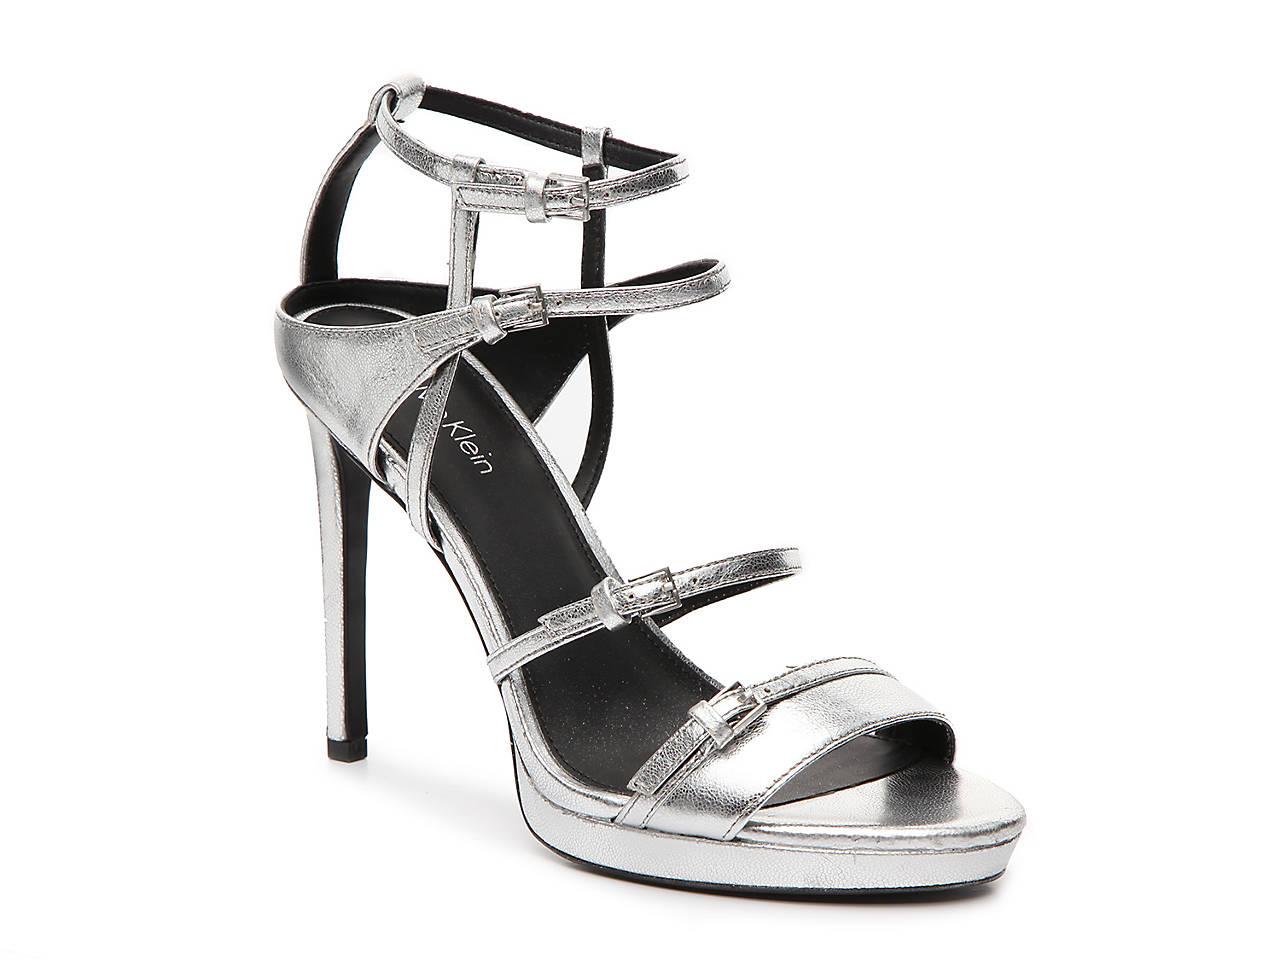 9c8f43f1c6a Calvin Klein Shantell Platform Sandal Women s Shoes